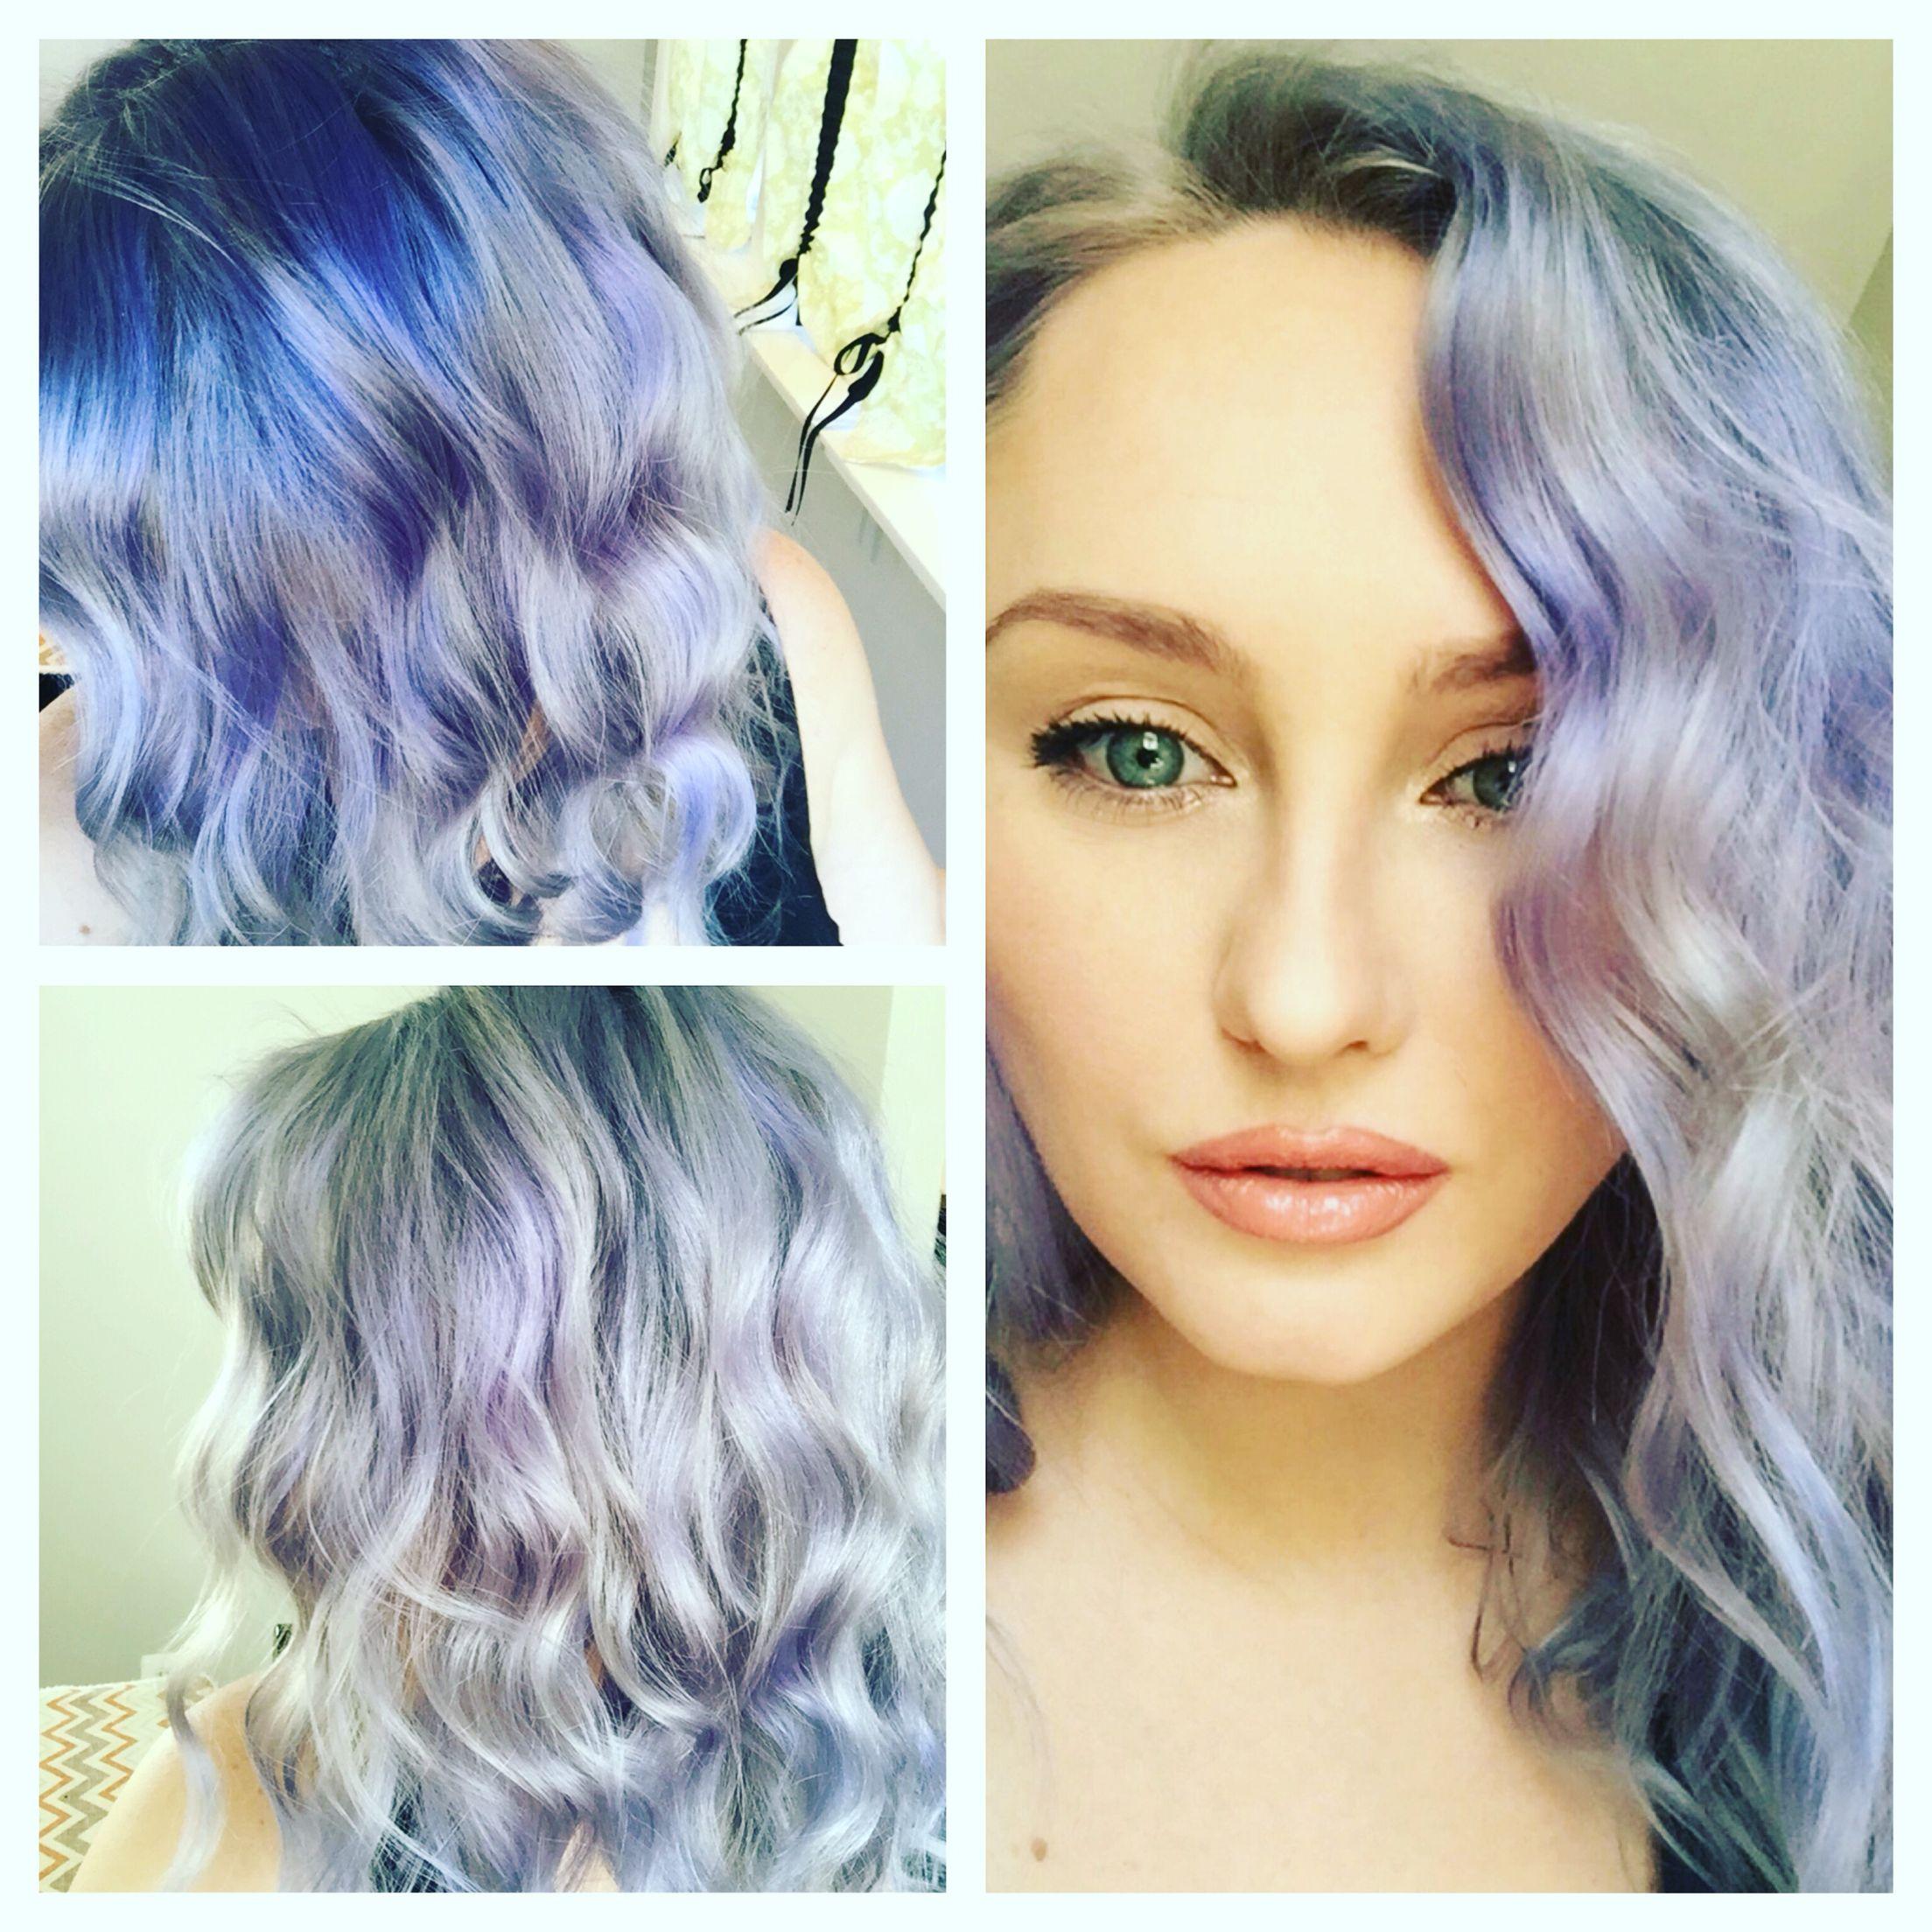 Love this color and style blue hair purple hair lavender hair